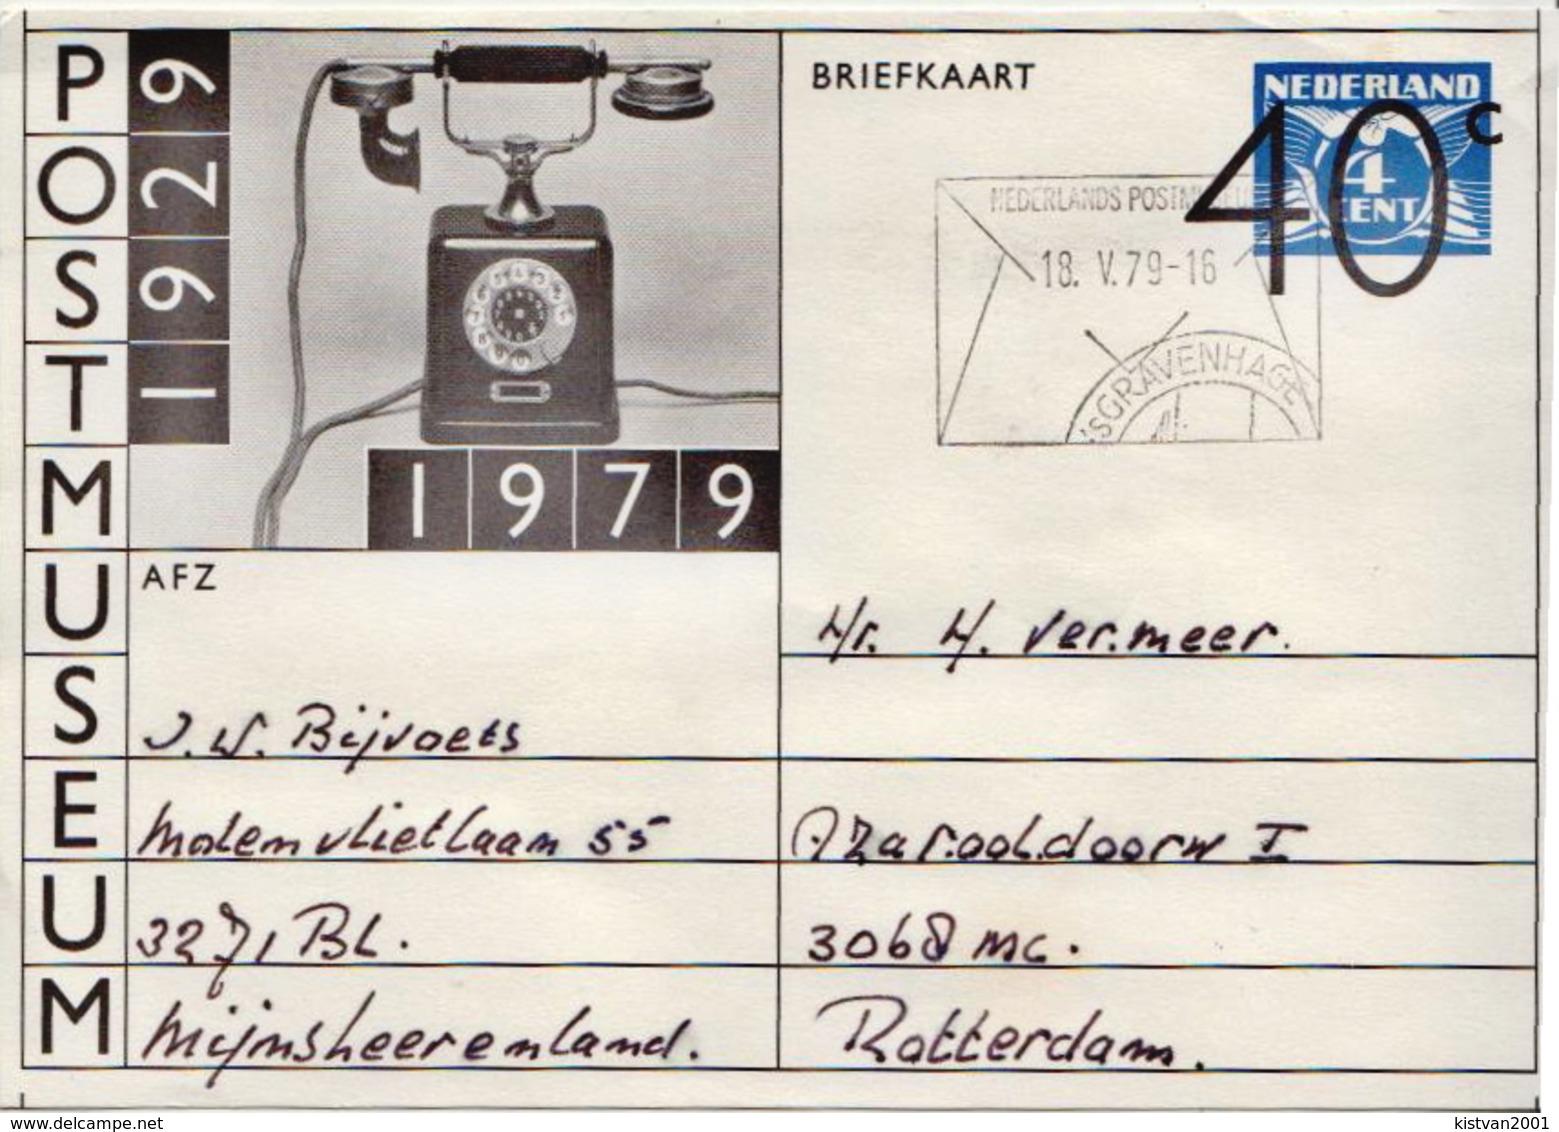 Netherlands Used Postal Stationery Card - Postal Stationery